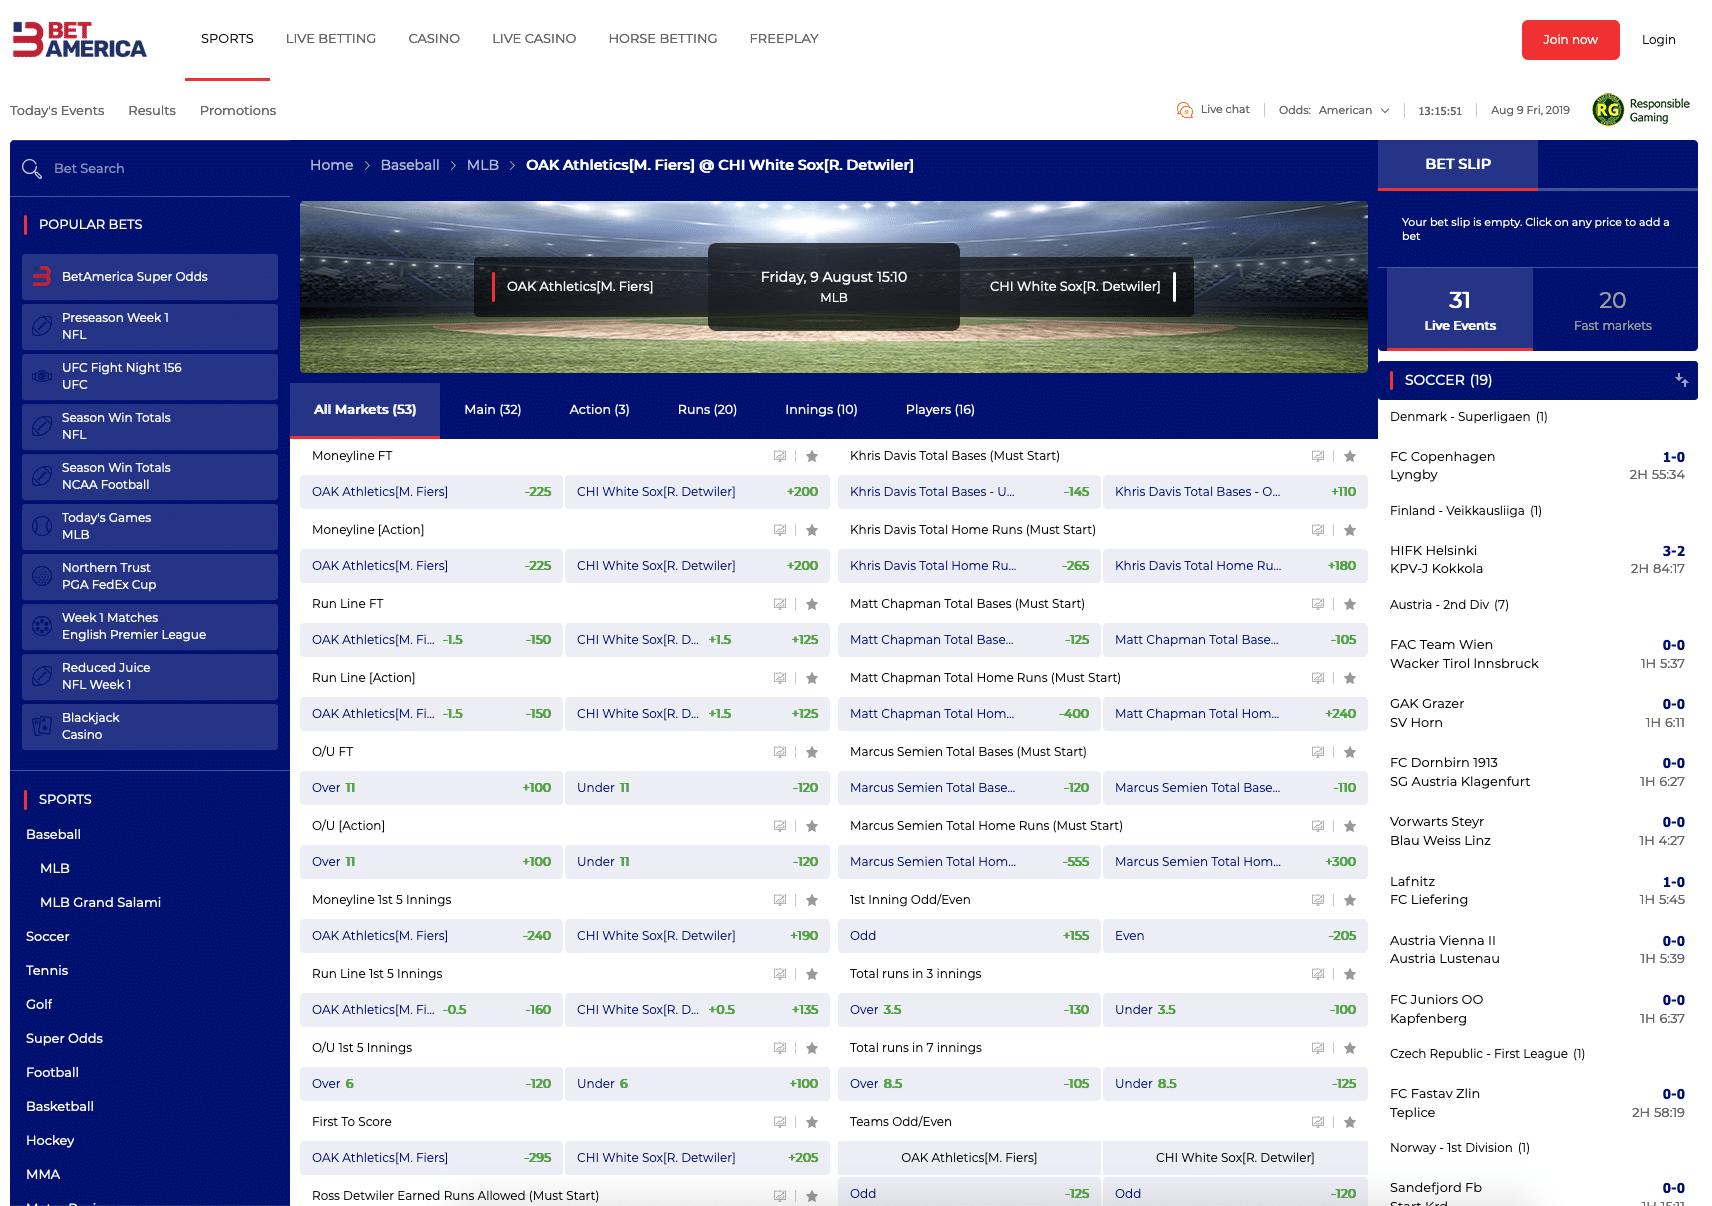 BetAmerica sports betting